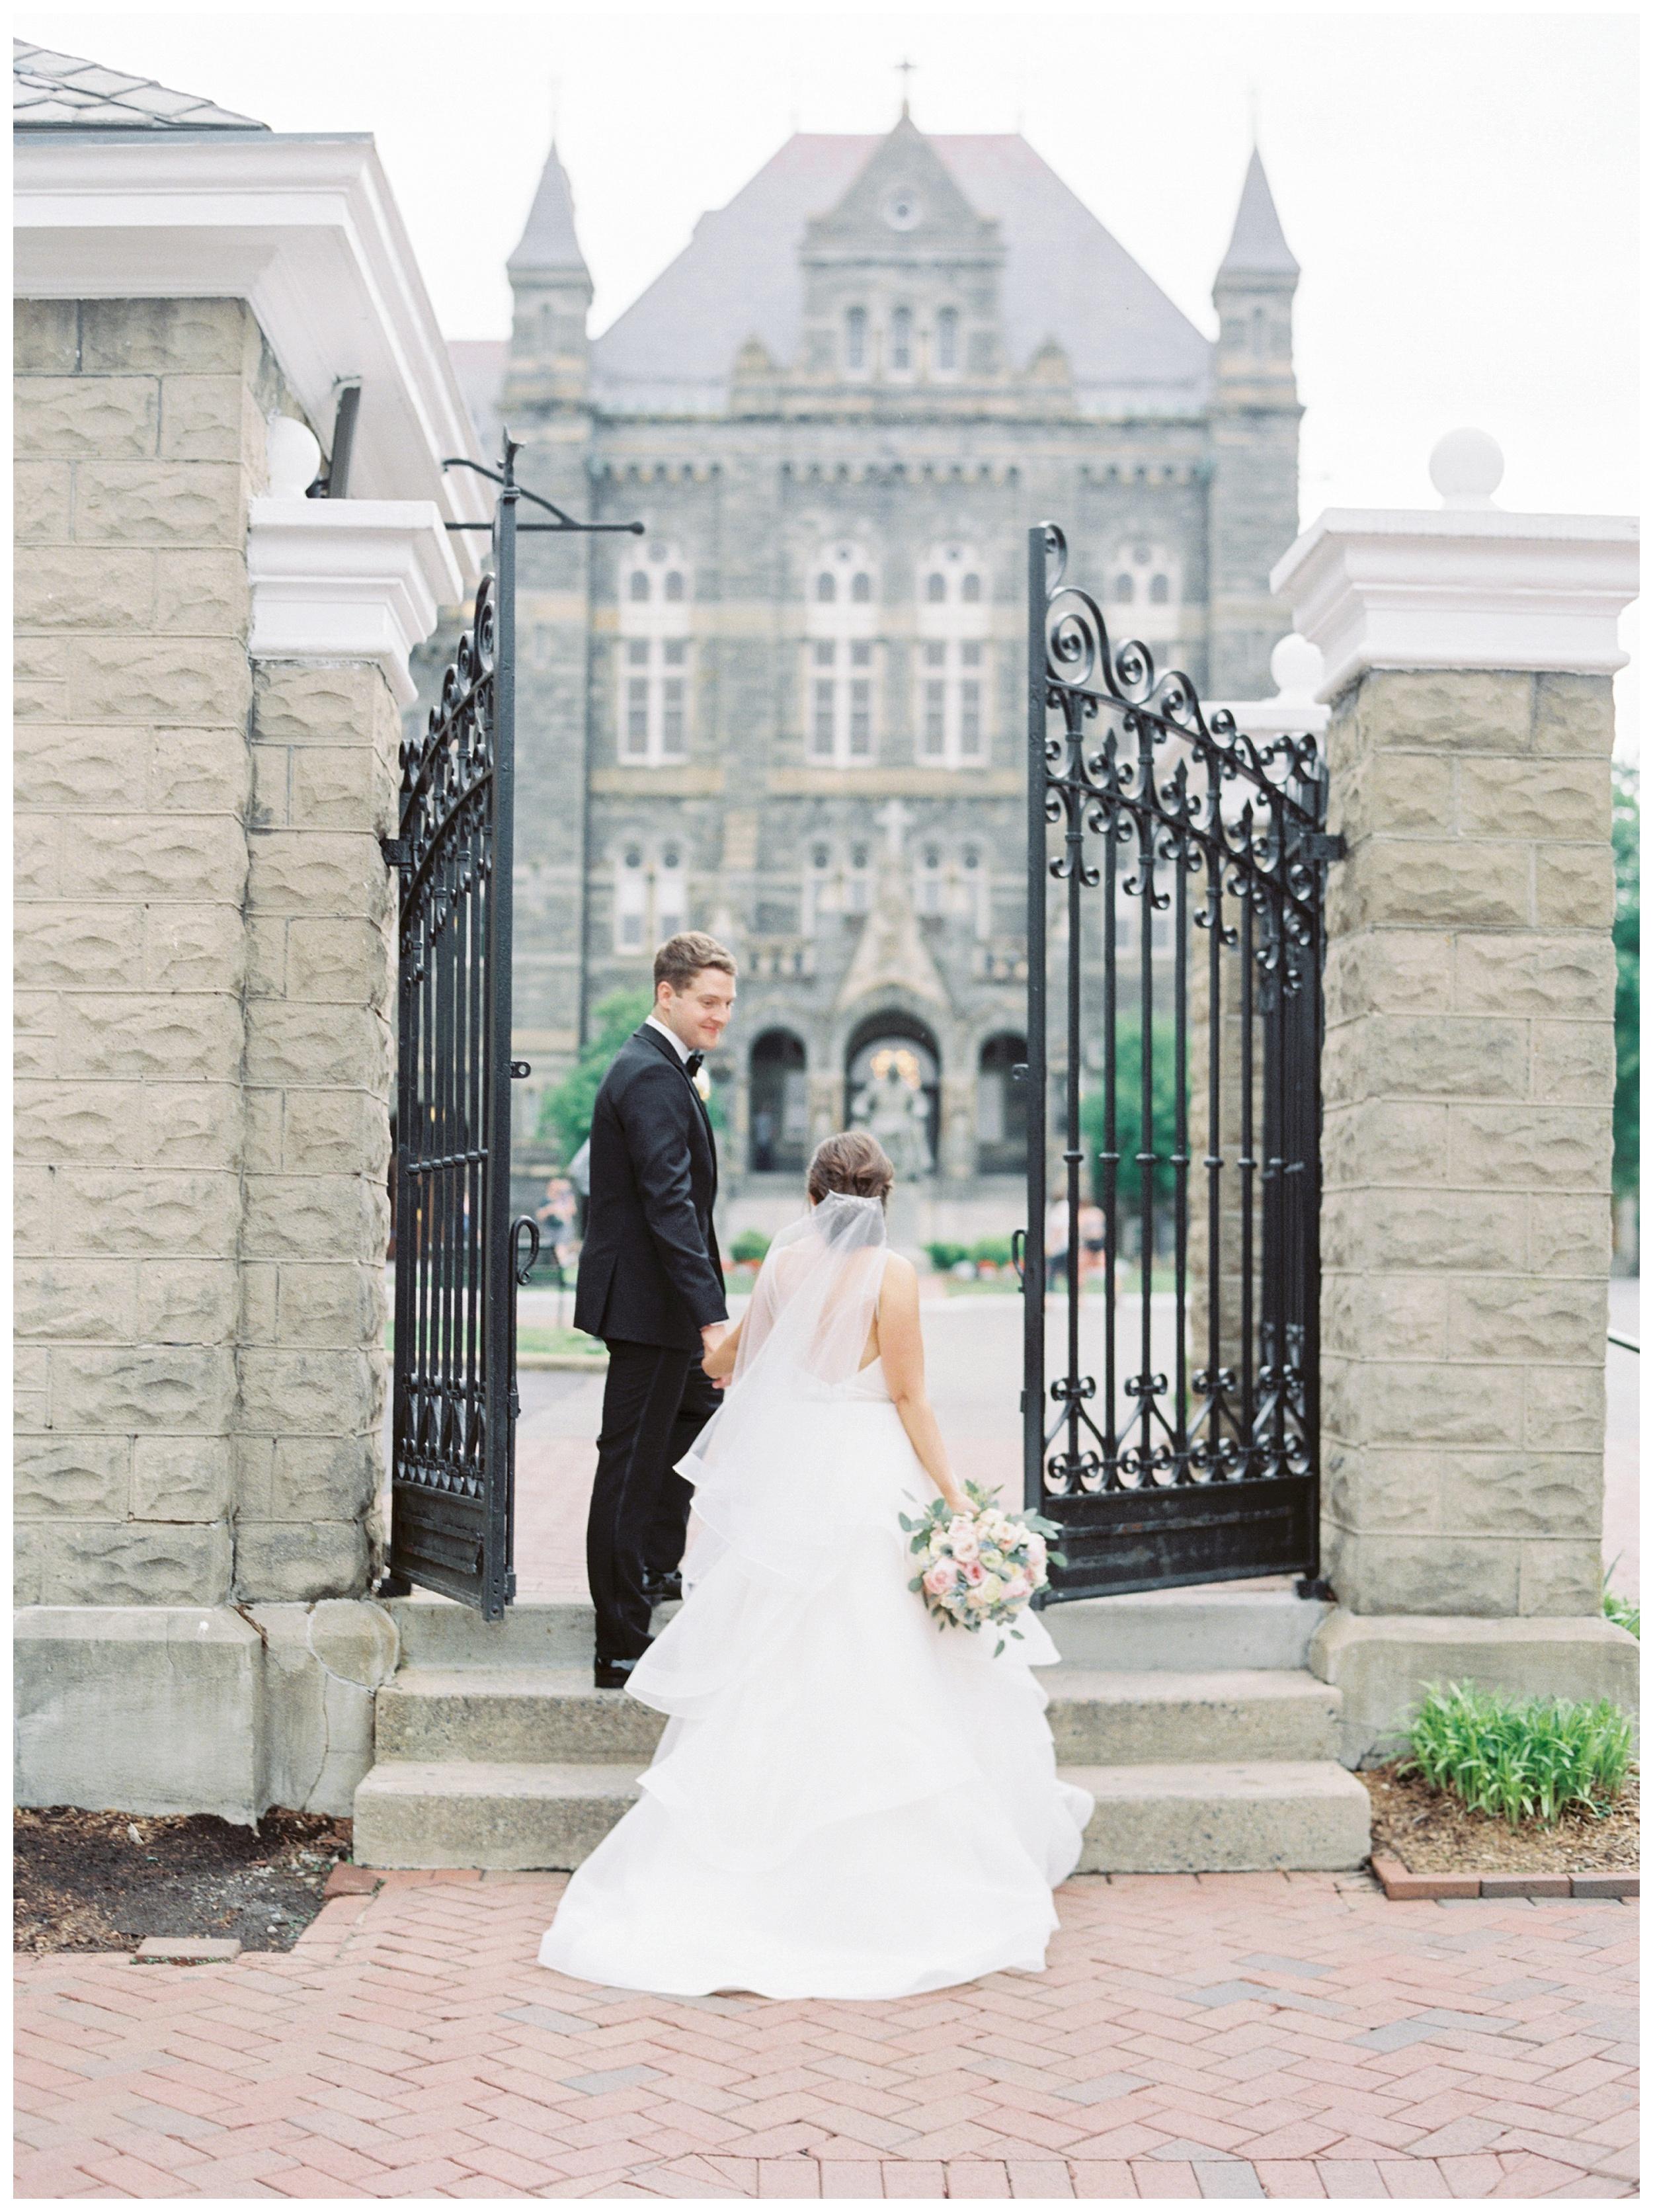 DAR Constitution Hall Wedding Wedding | Daughters of the American Revolution Wedding | District of Columbia Film Wedding Photographer Kir Tuben_0062.jpg